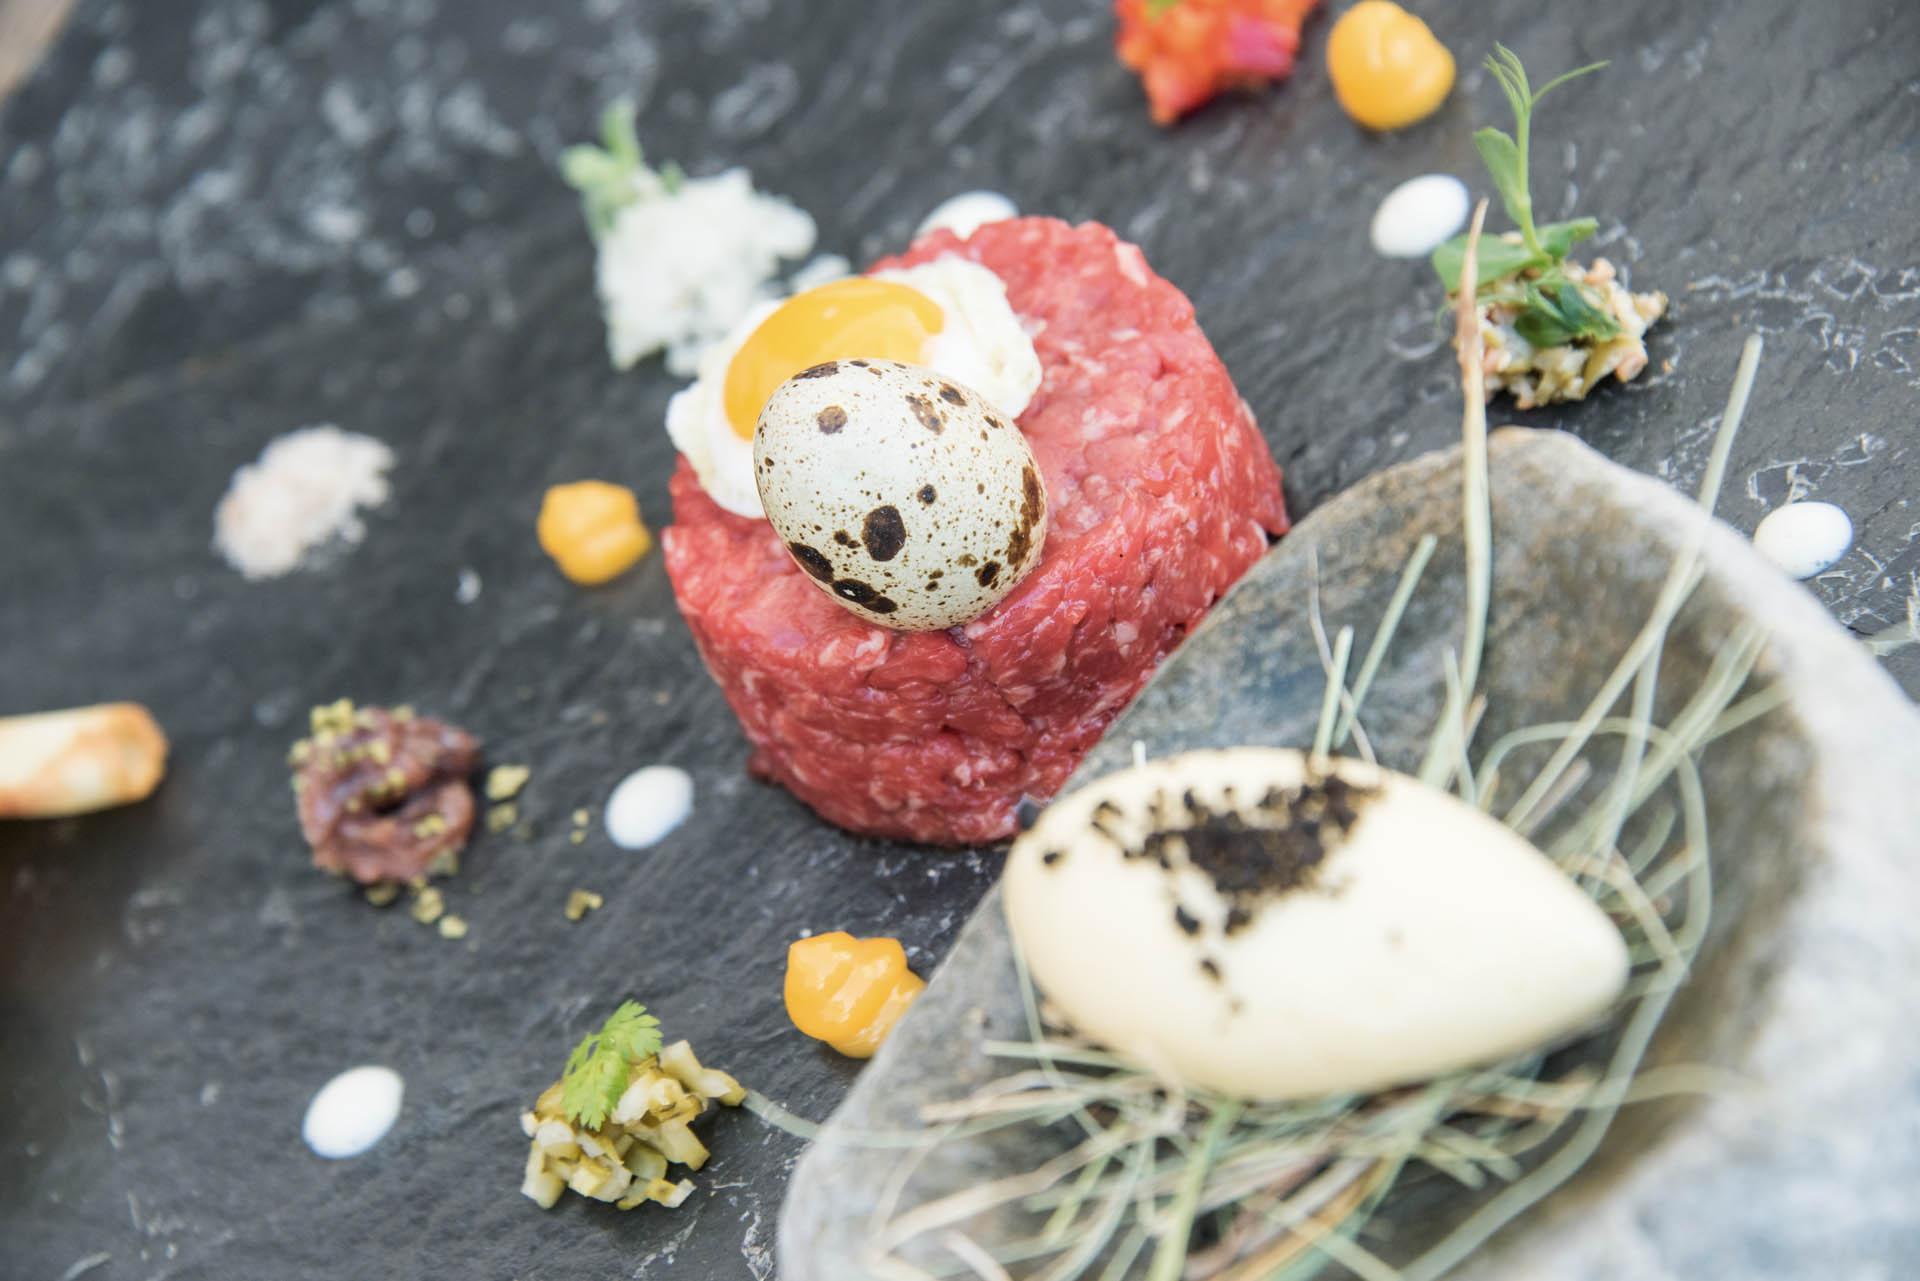 Gourmet Hotel In Alto Adige Buoni Sapori Al Plunhof